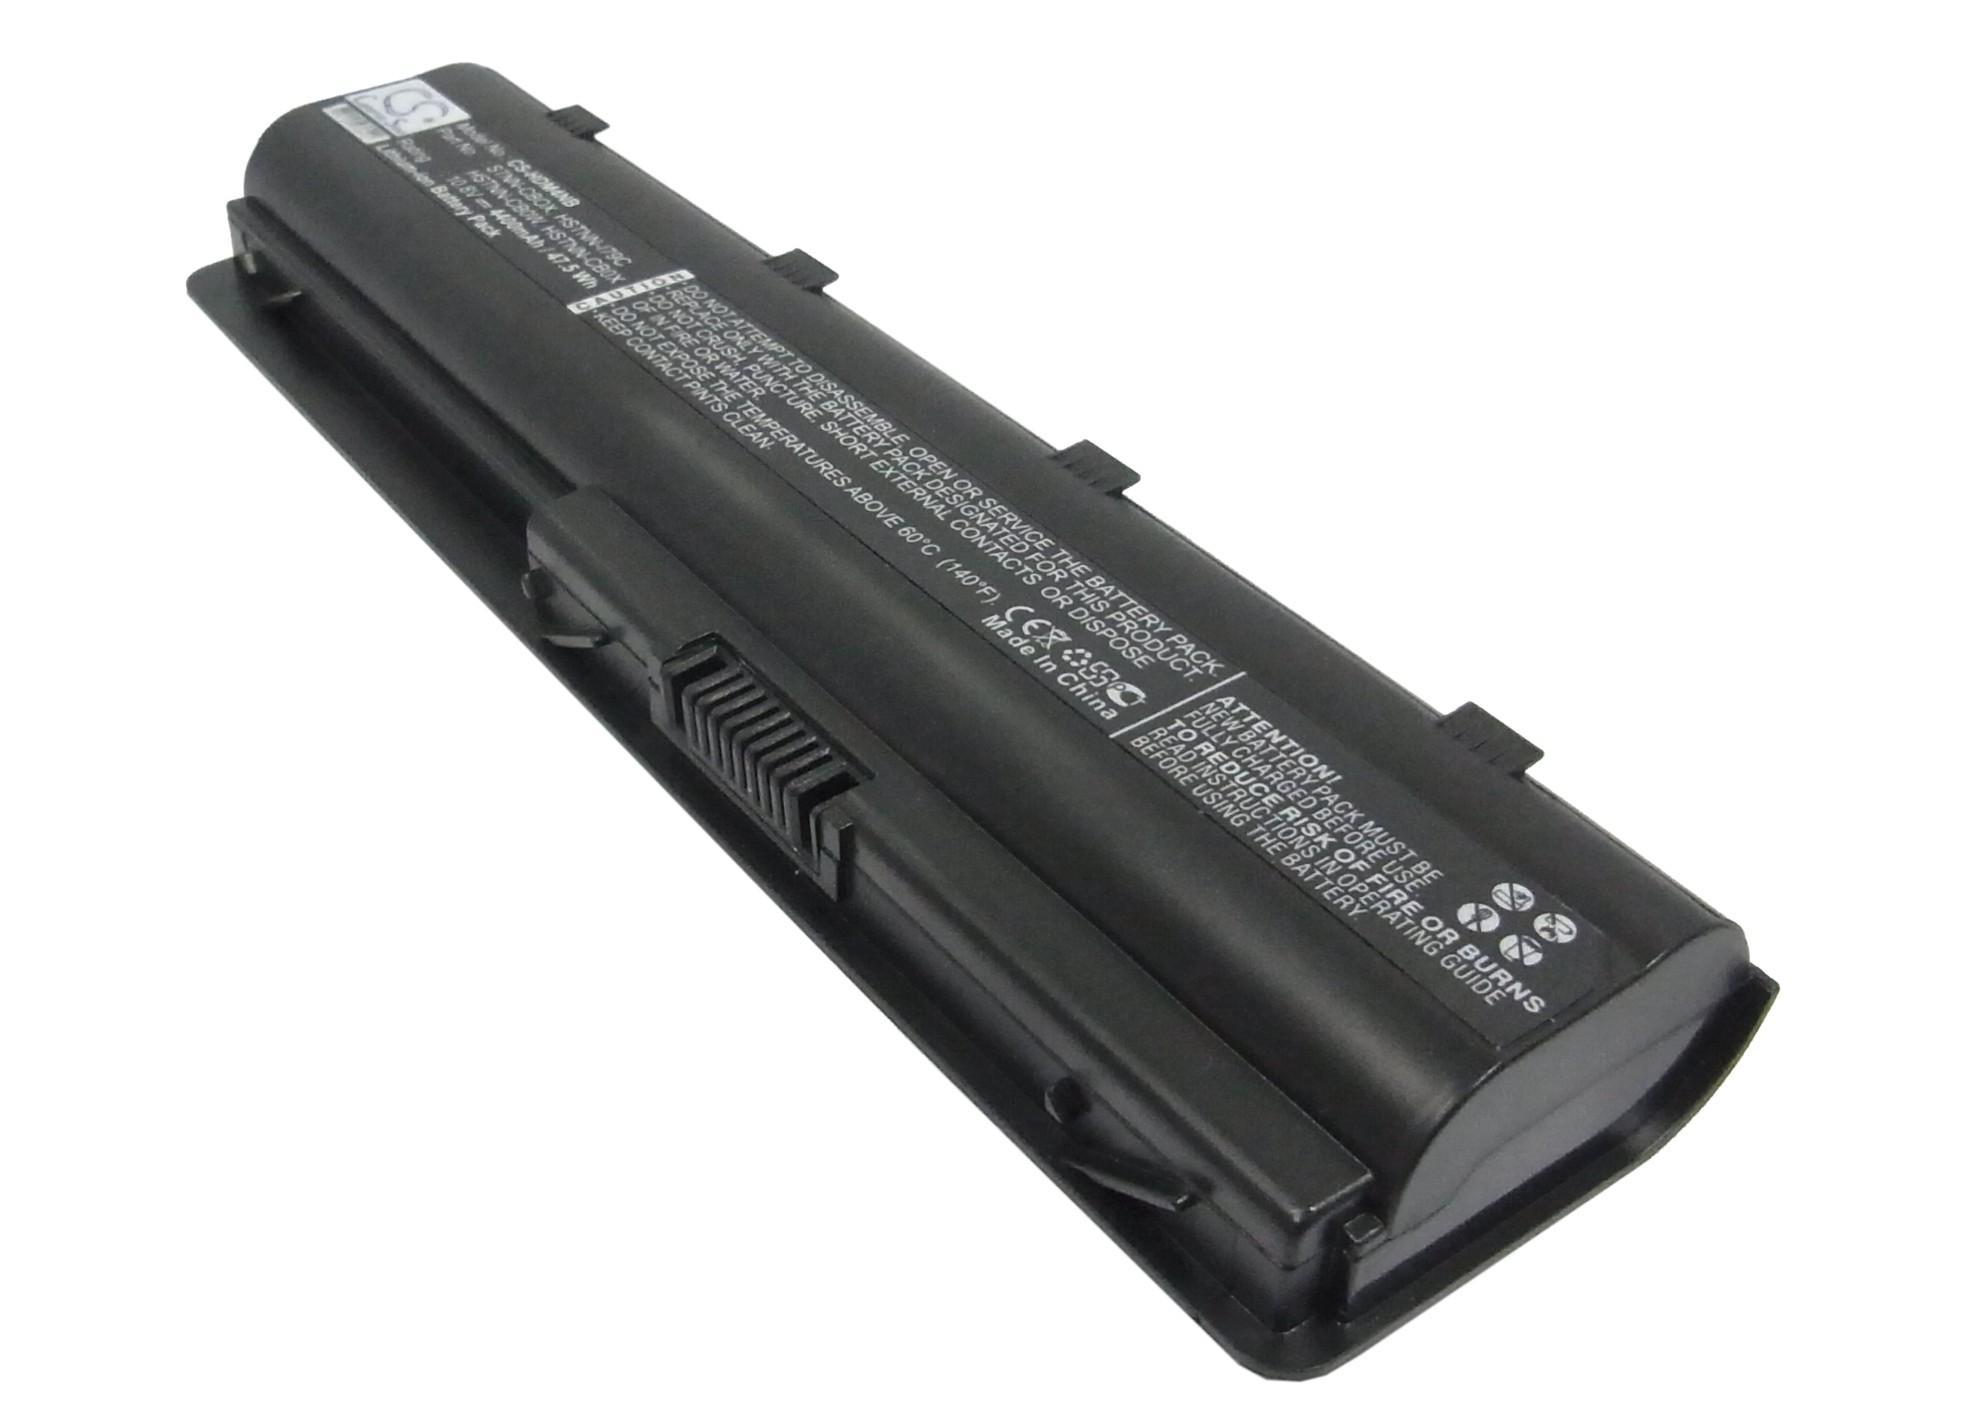 Батерия  за лаптоп HP G32/G42/G62/G72 Presario CQ31/CQ42 10.8V, 5200mAh, Черен, Cameron sino